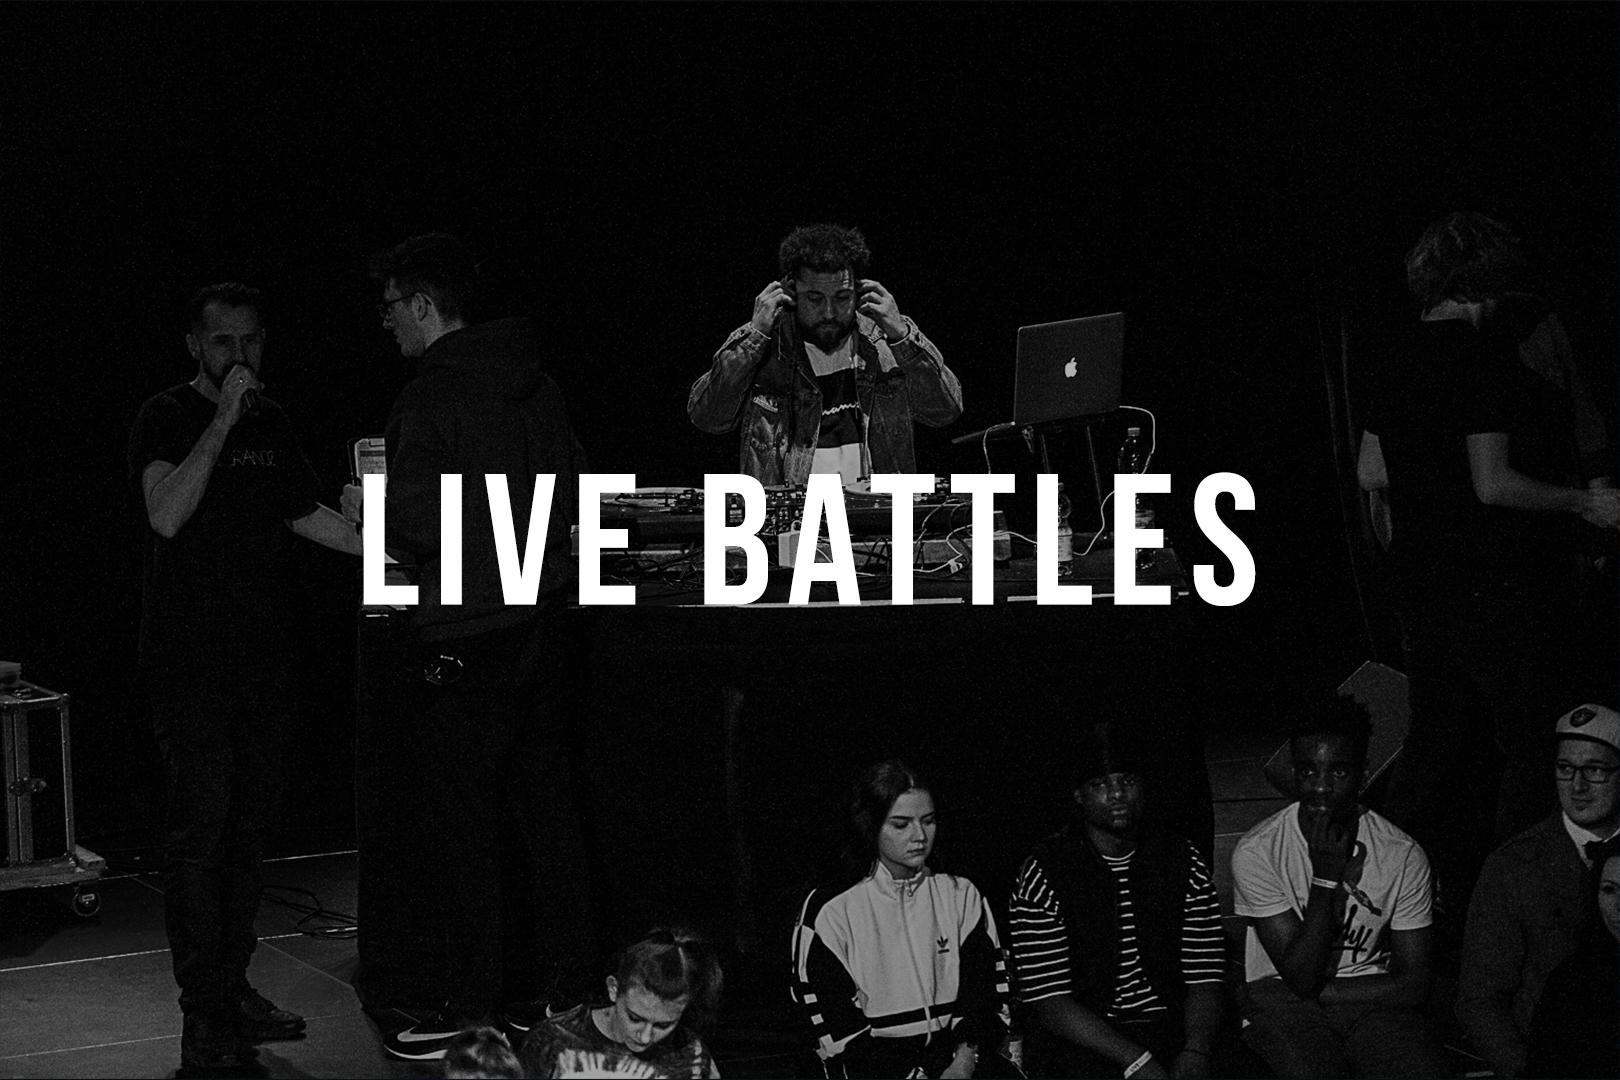 fb live battles.jpg